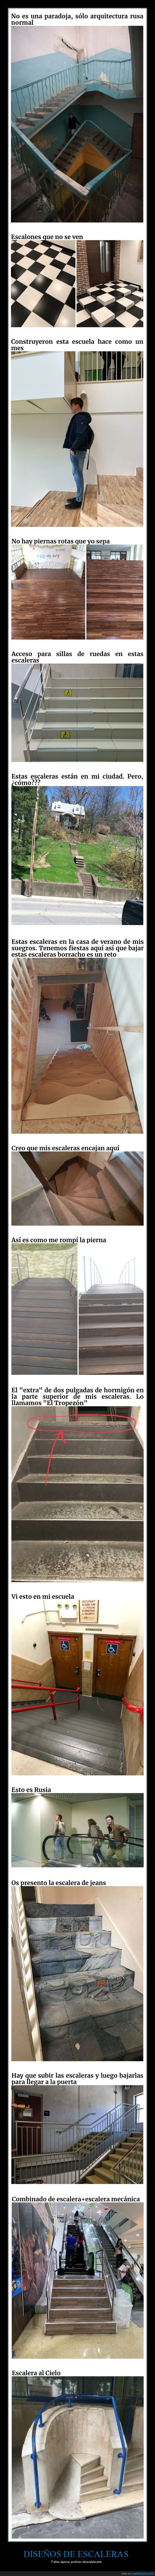 escaleras,fails